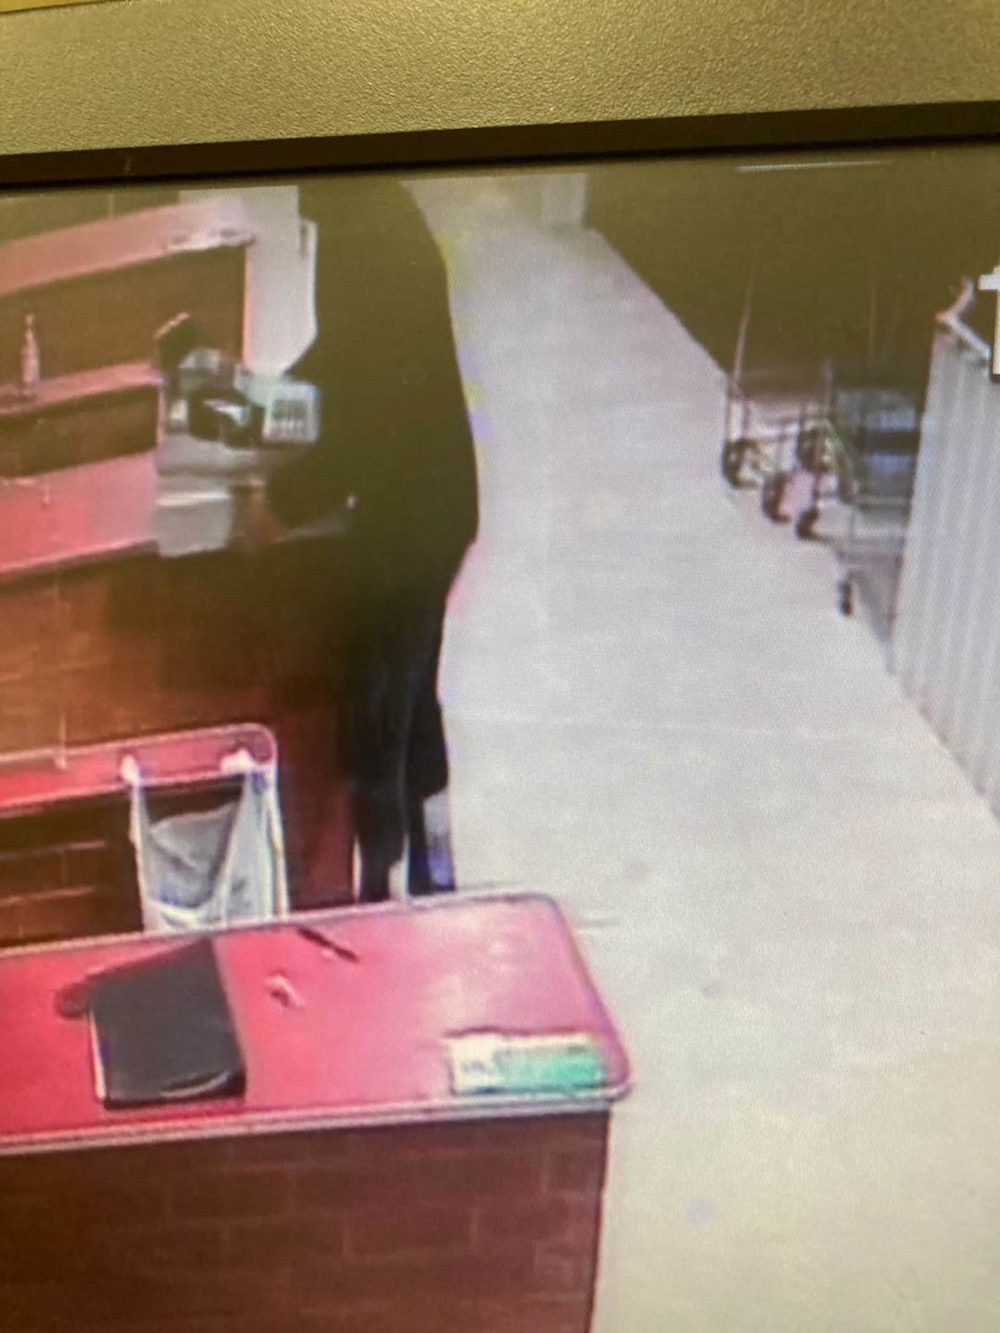 The thug wandered around unaware of CCTV - Crime News UK